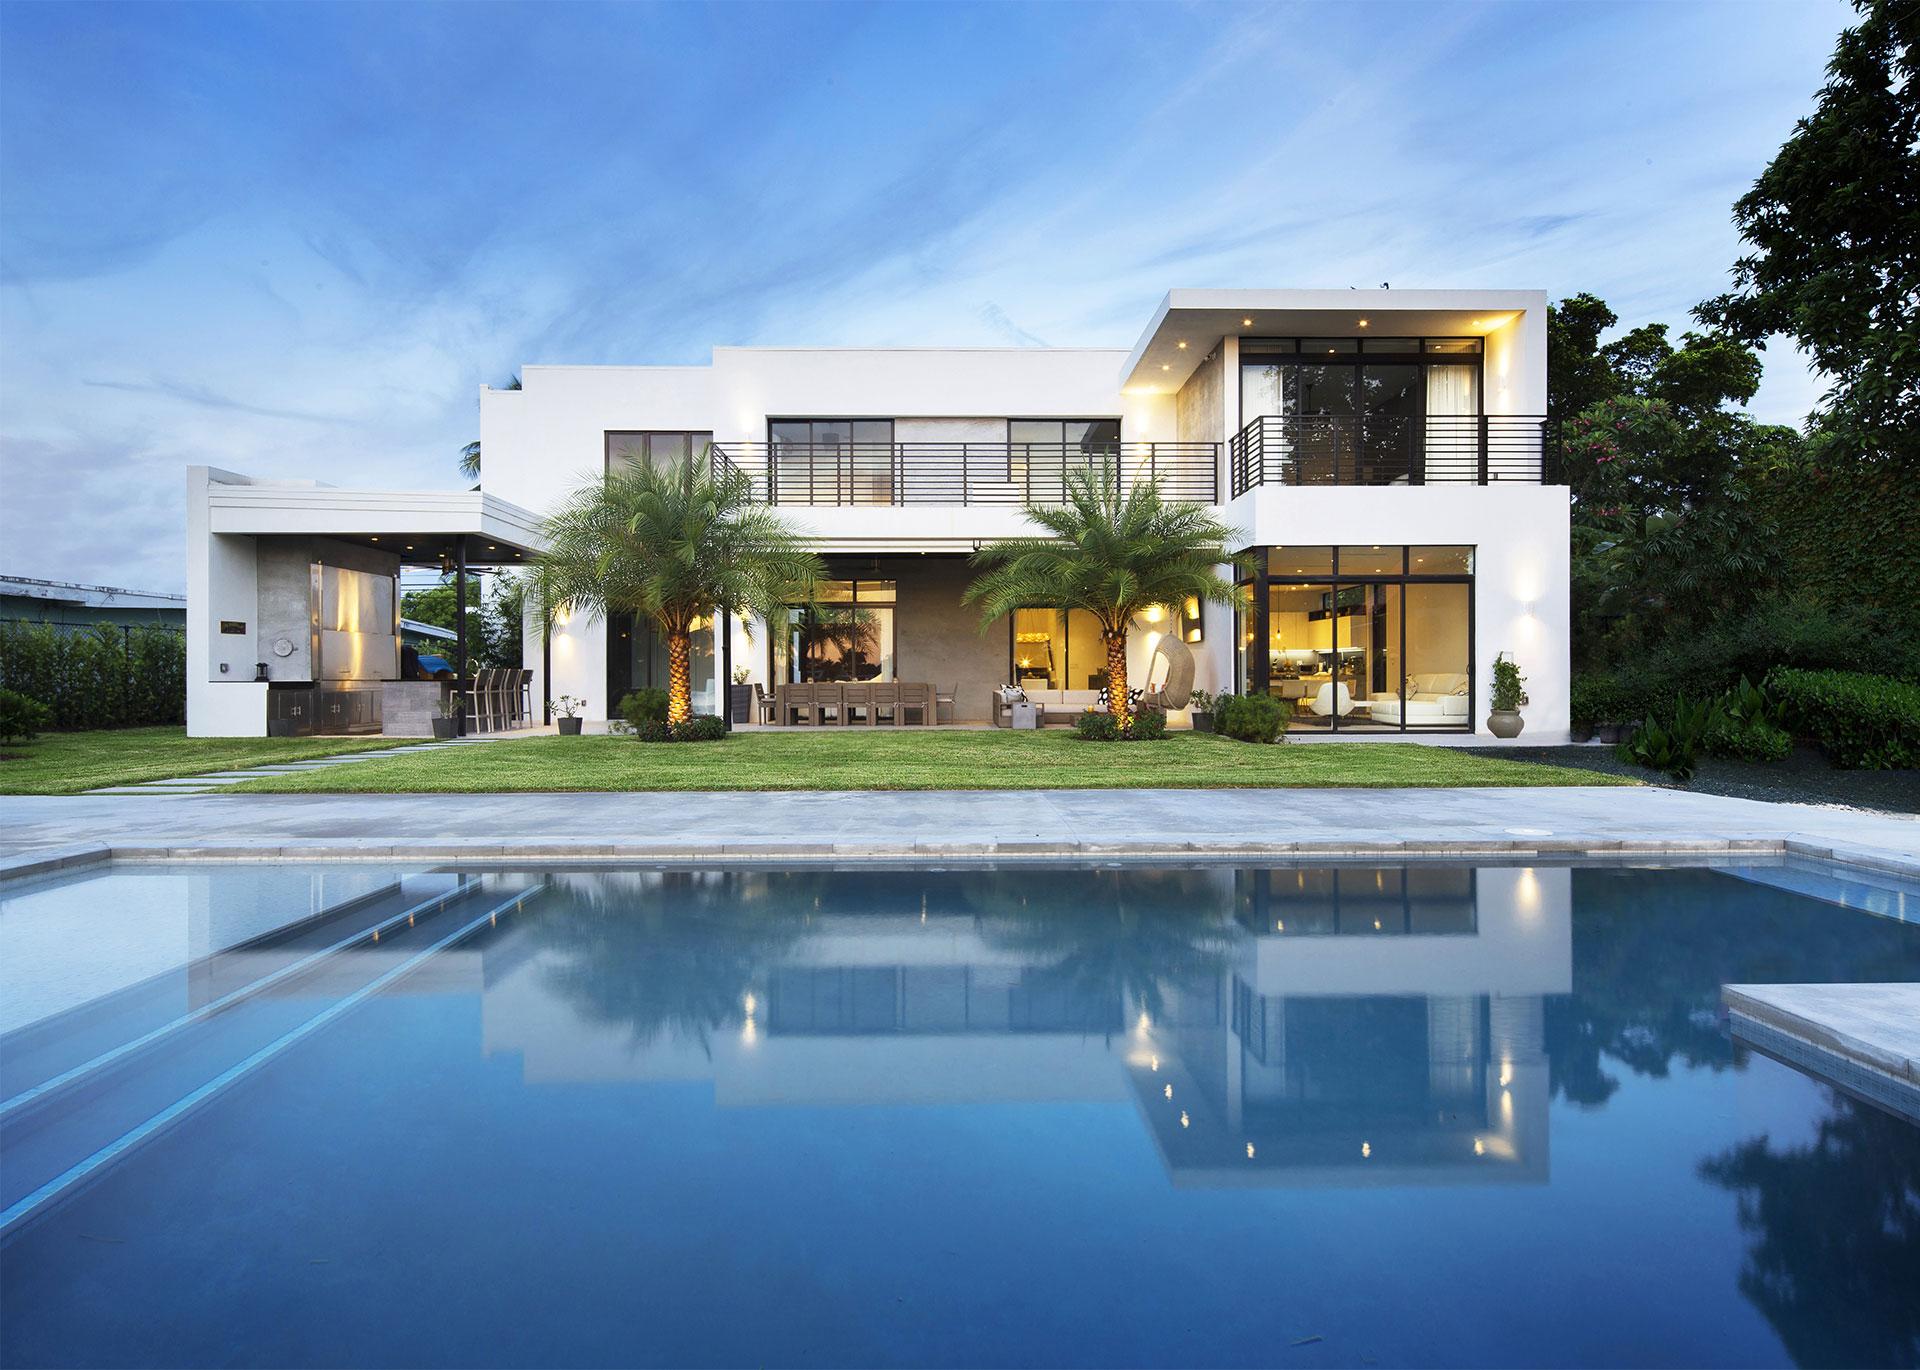 Swimming Pool View Exterior Architecture project in North Miami Beach, Florida